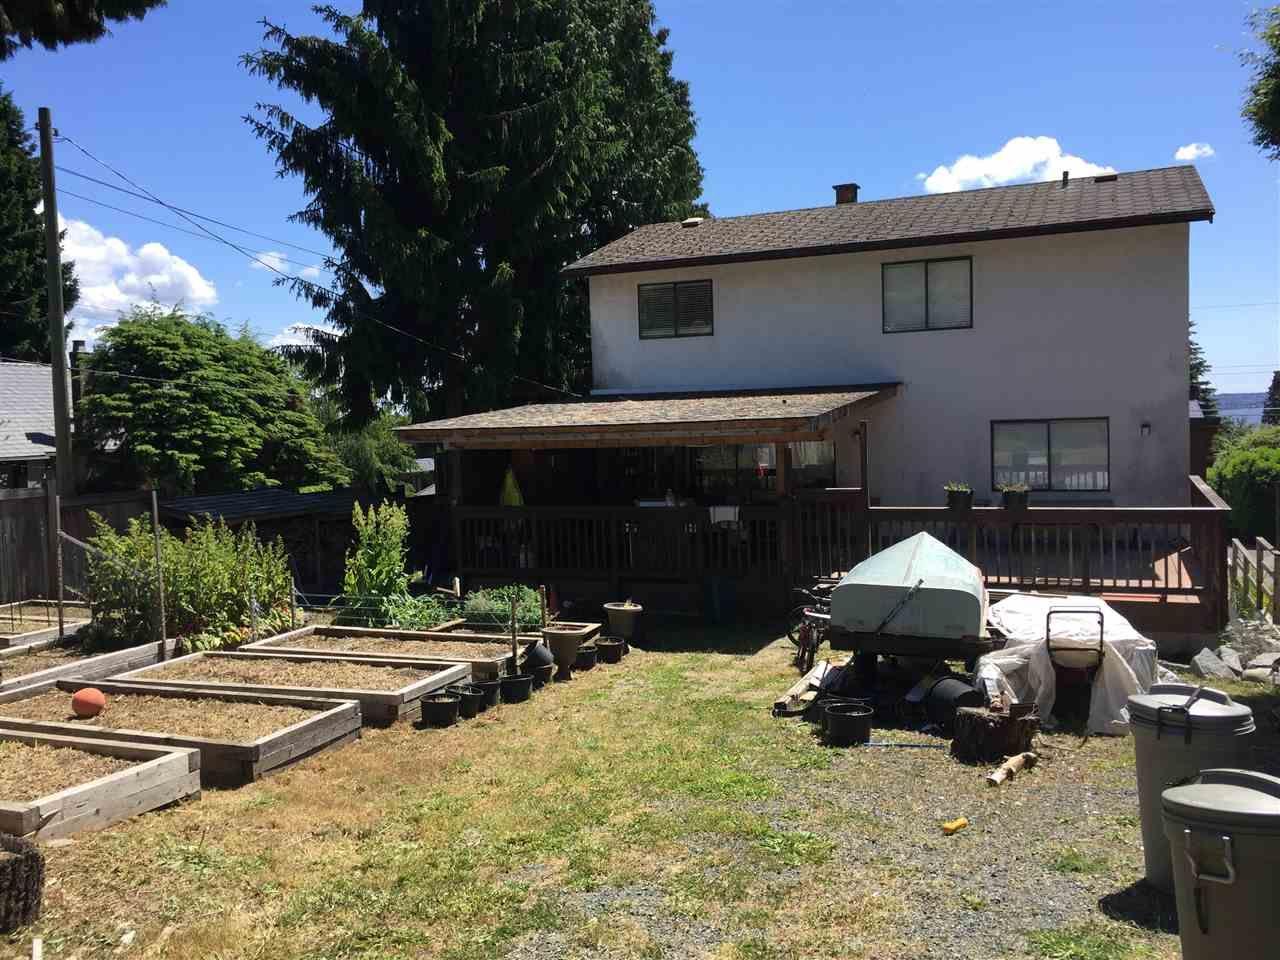 Photo 2: Photos: 1507 JEFFERSON AVENUE in West Vancouver: Ambleside House for sale : MLS®# R2274486